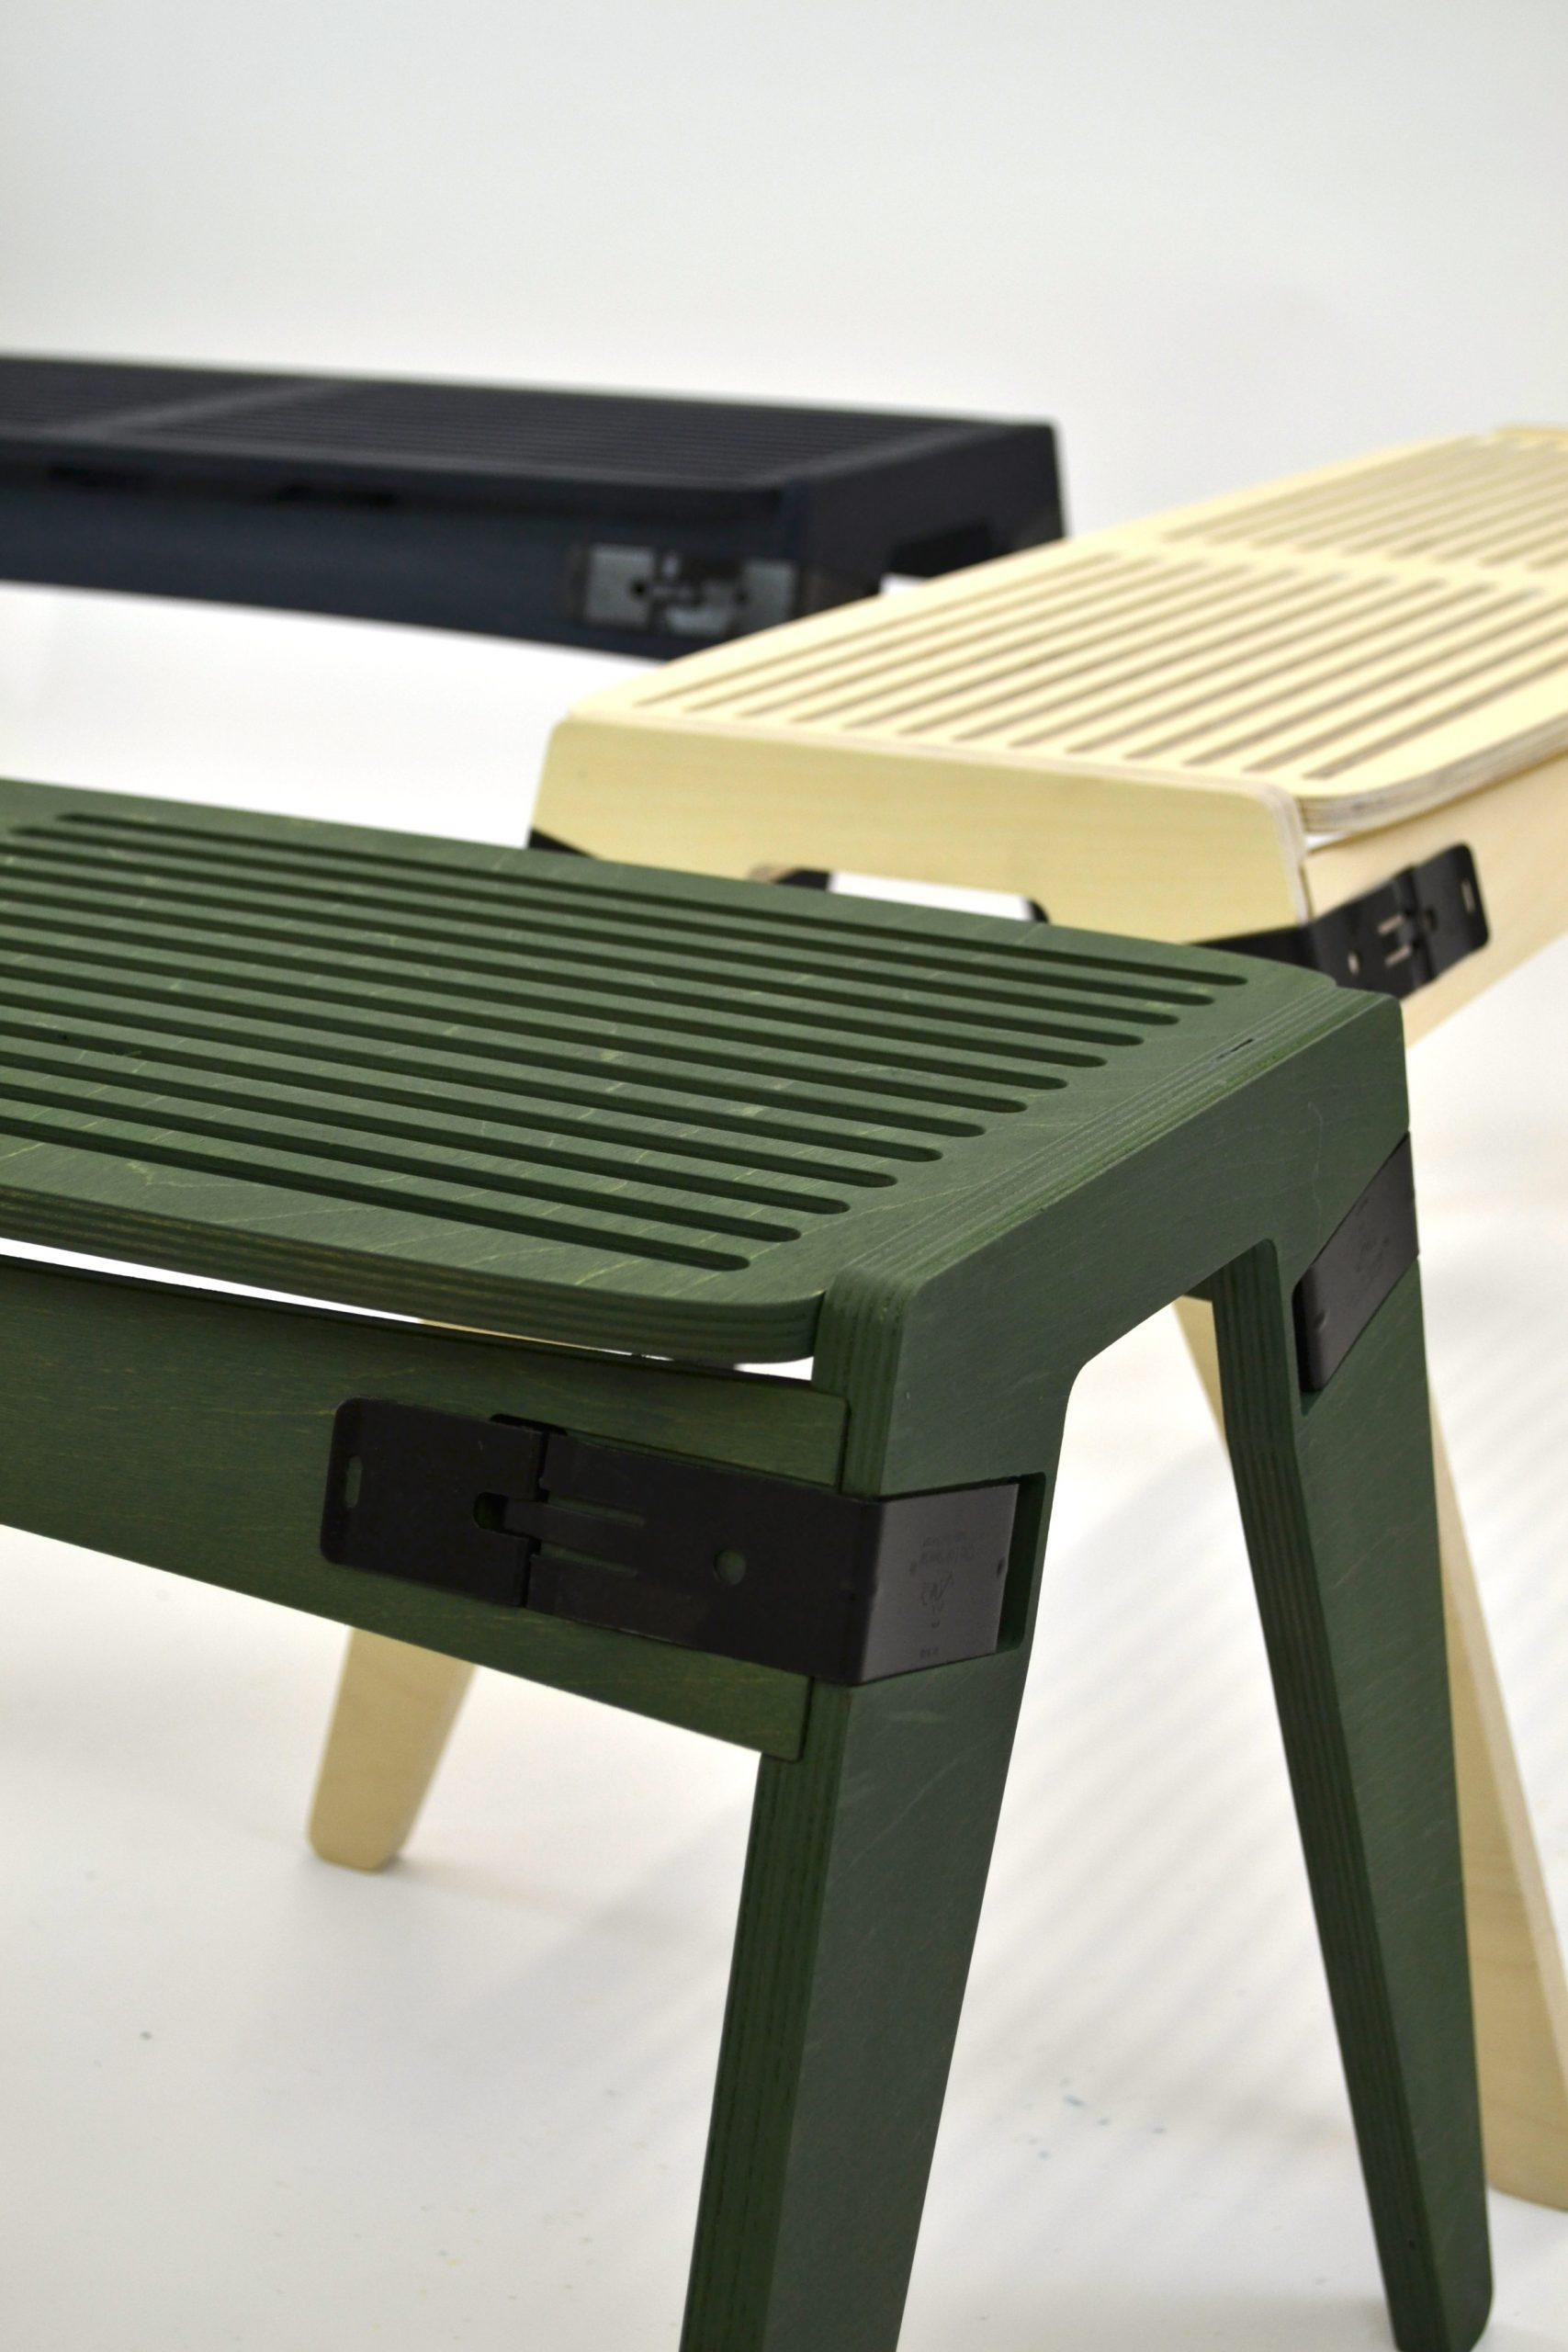 Originals flat-pack bench by Fuzl Studio